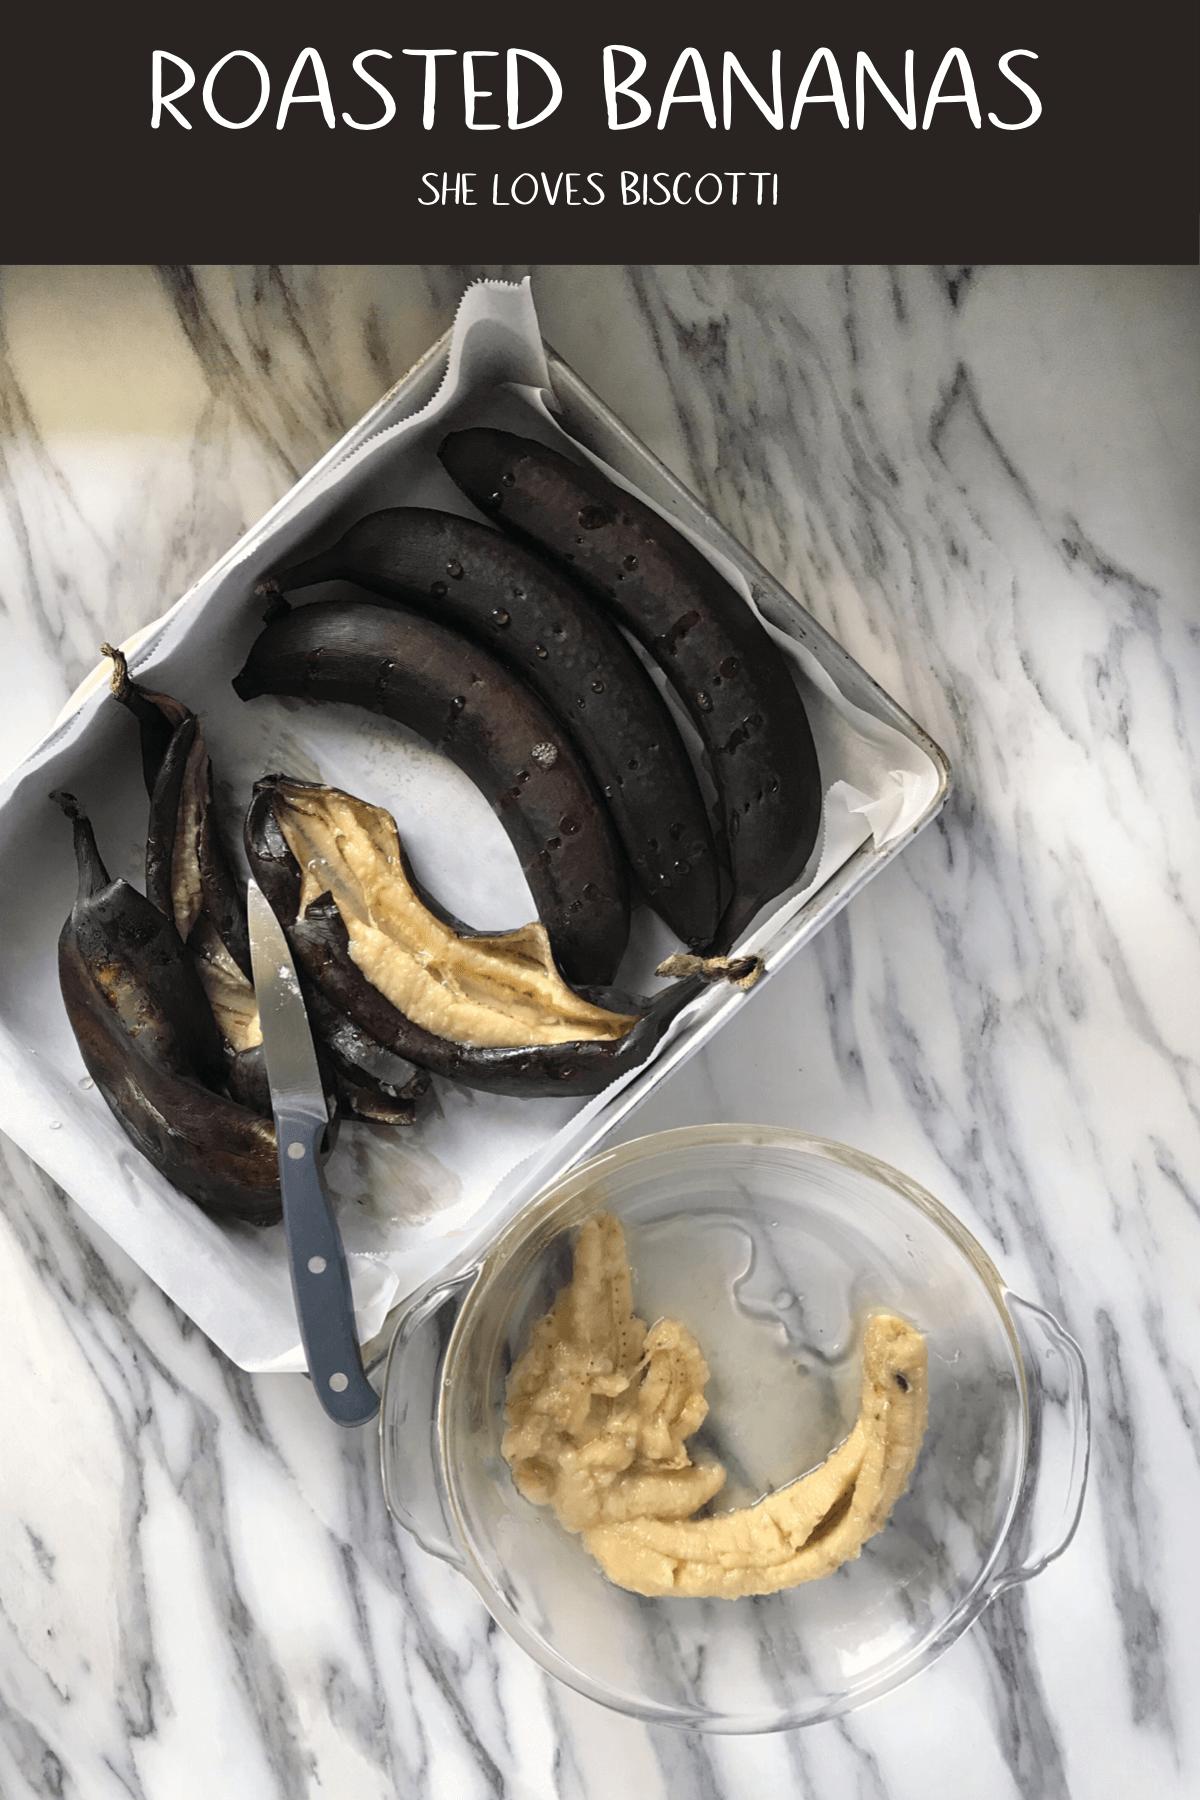 Roasted bananas is the secret to the best banana bread and banana muffins. You gotta try this! #shelovesbiscotti #roastedbananas #bananabread #bestbananamuffins #howtoroastbananas